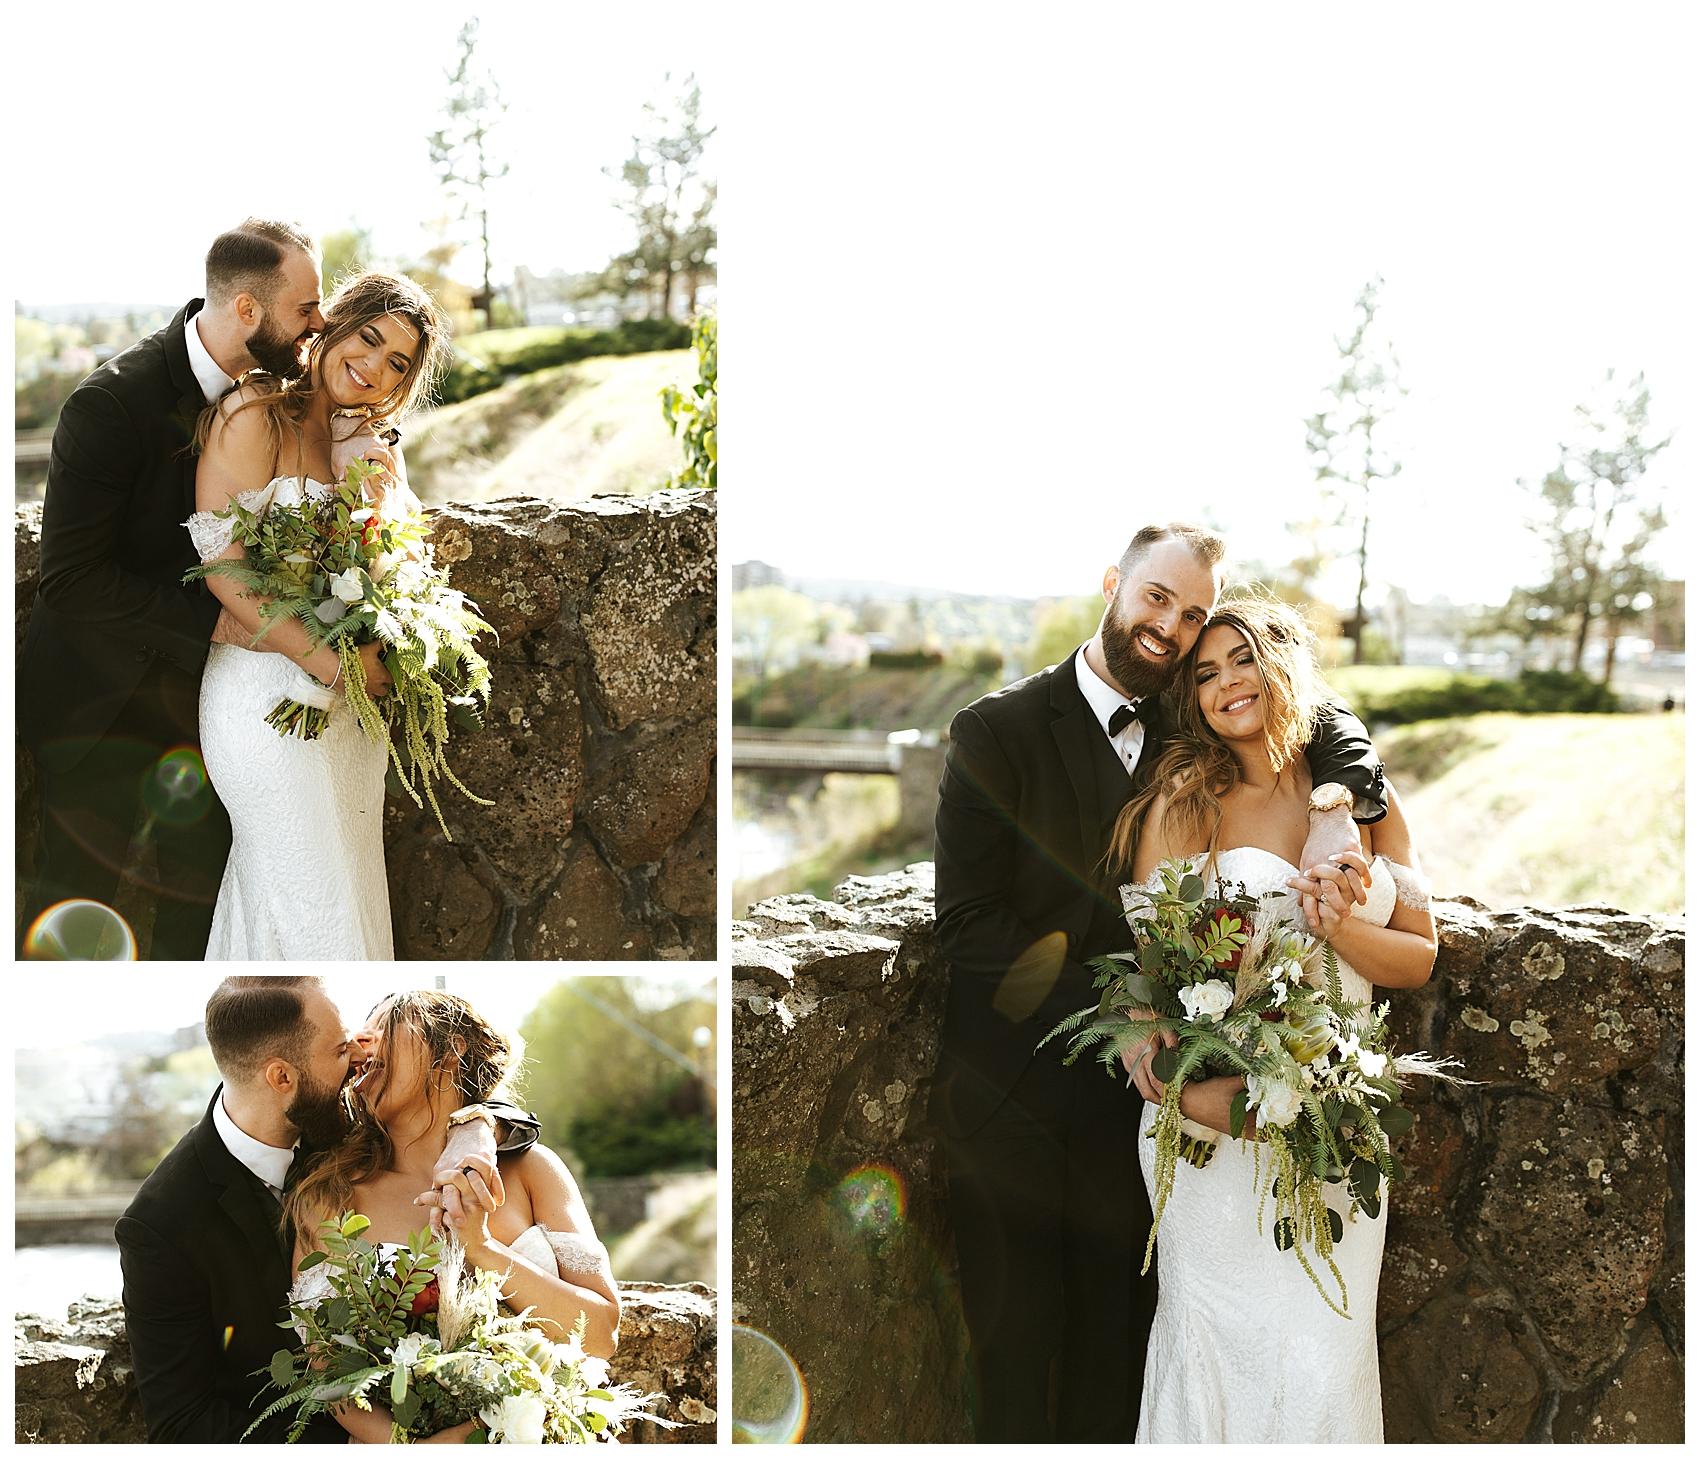 Chateau Rive Spokane Wedding Cassie Trottier Photography01095.jpg